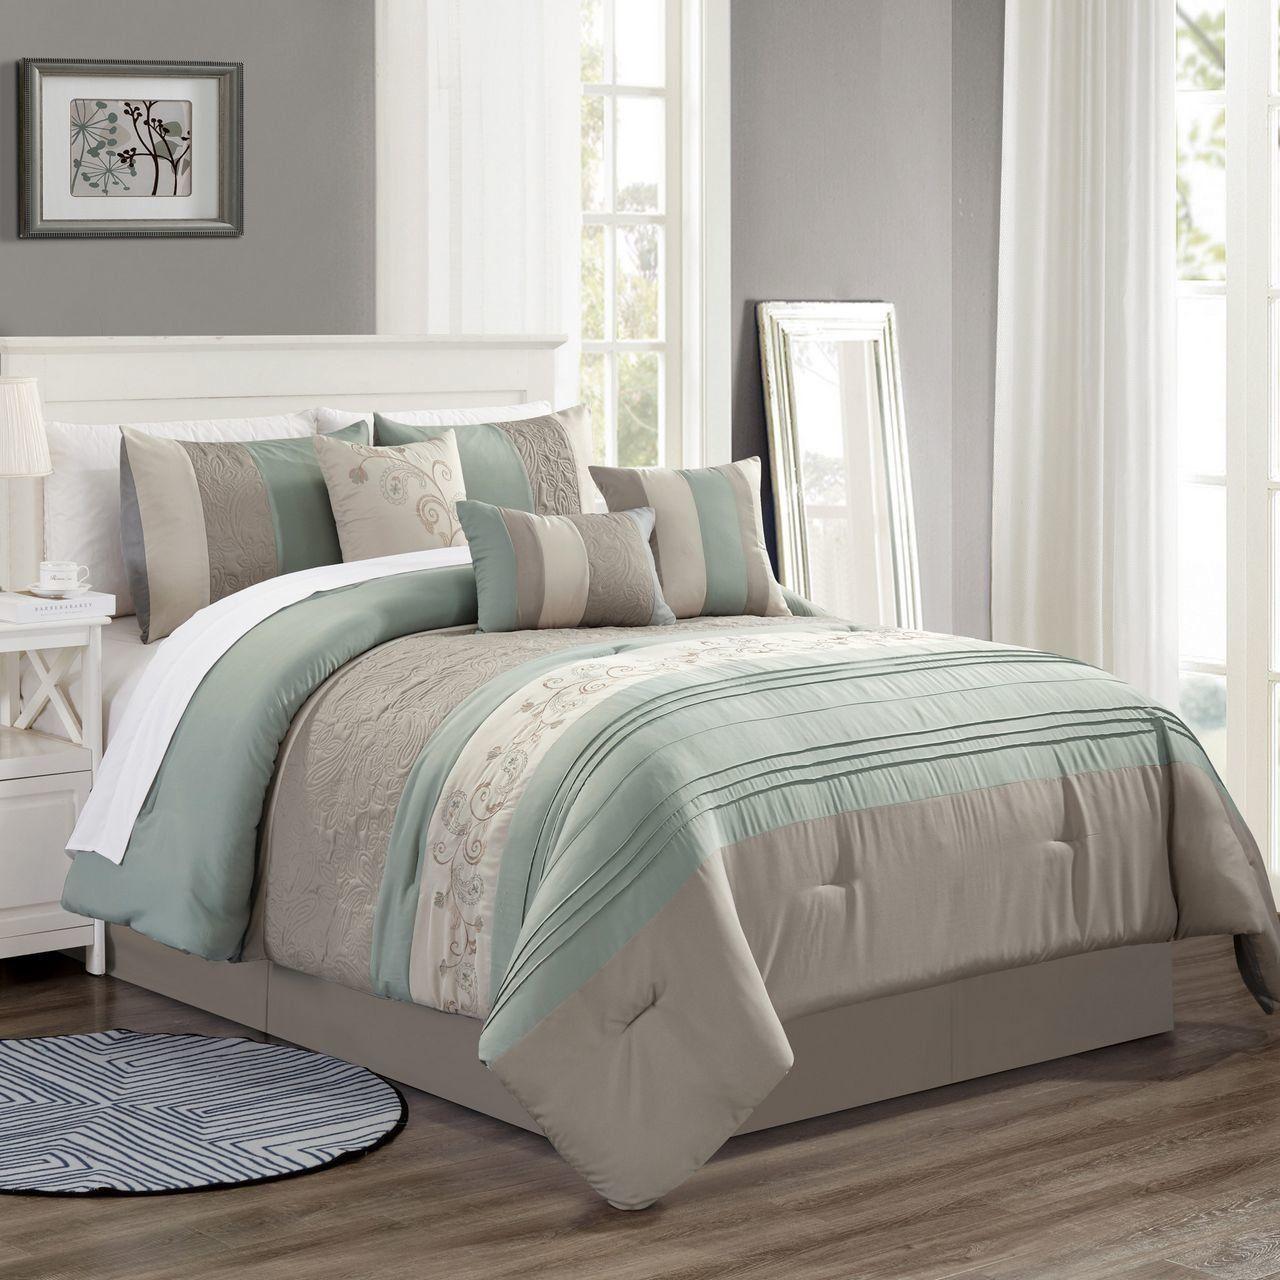 7 Piece Fenwick Sage Taupe Comforter Set In 2020 Taupe Bedding Taupe Comforter Comforter Sets